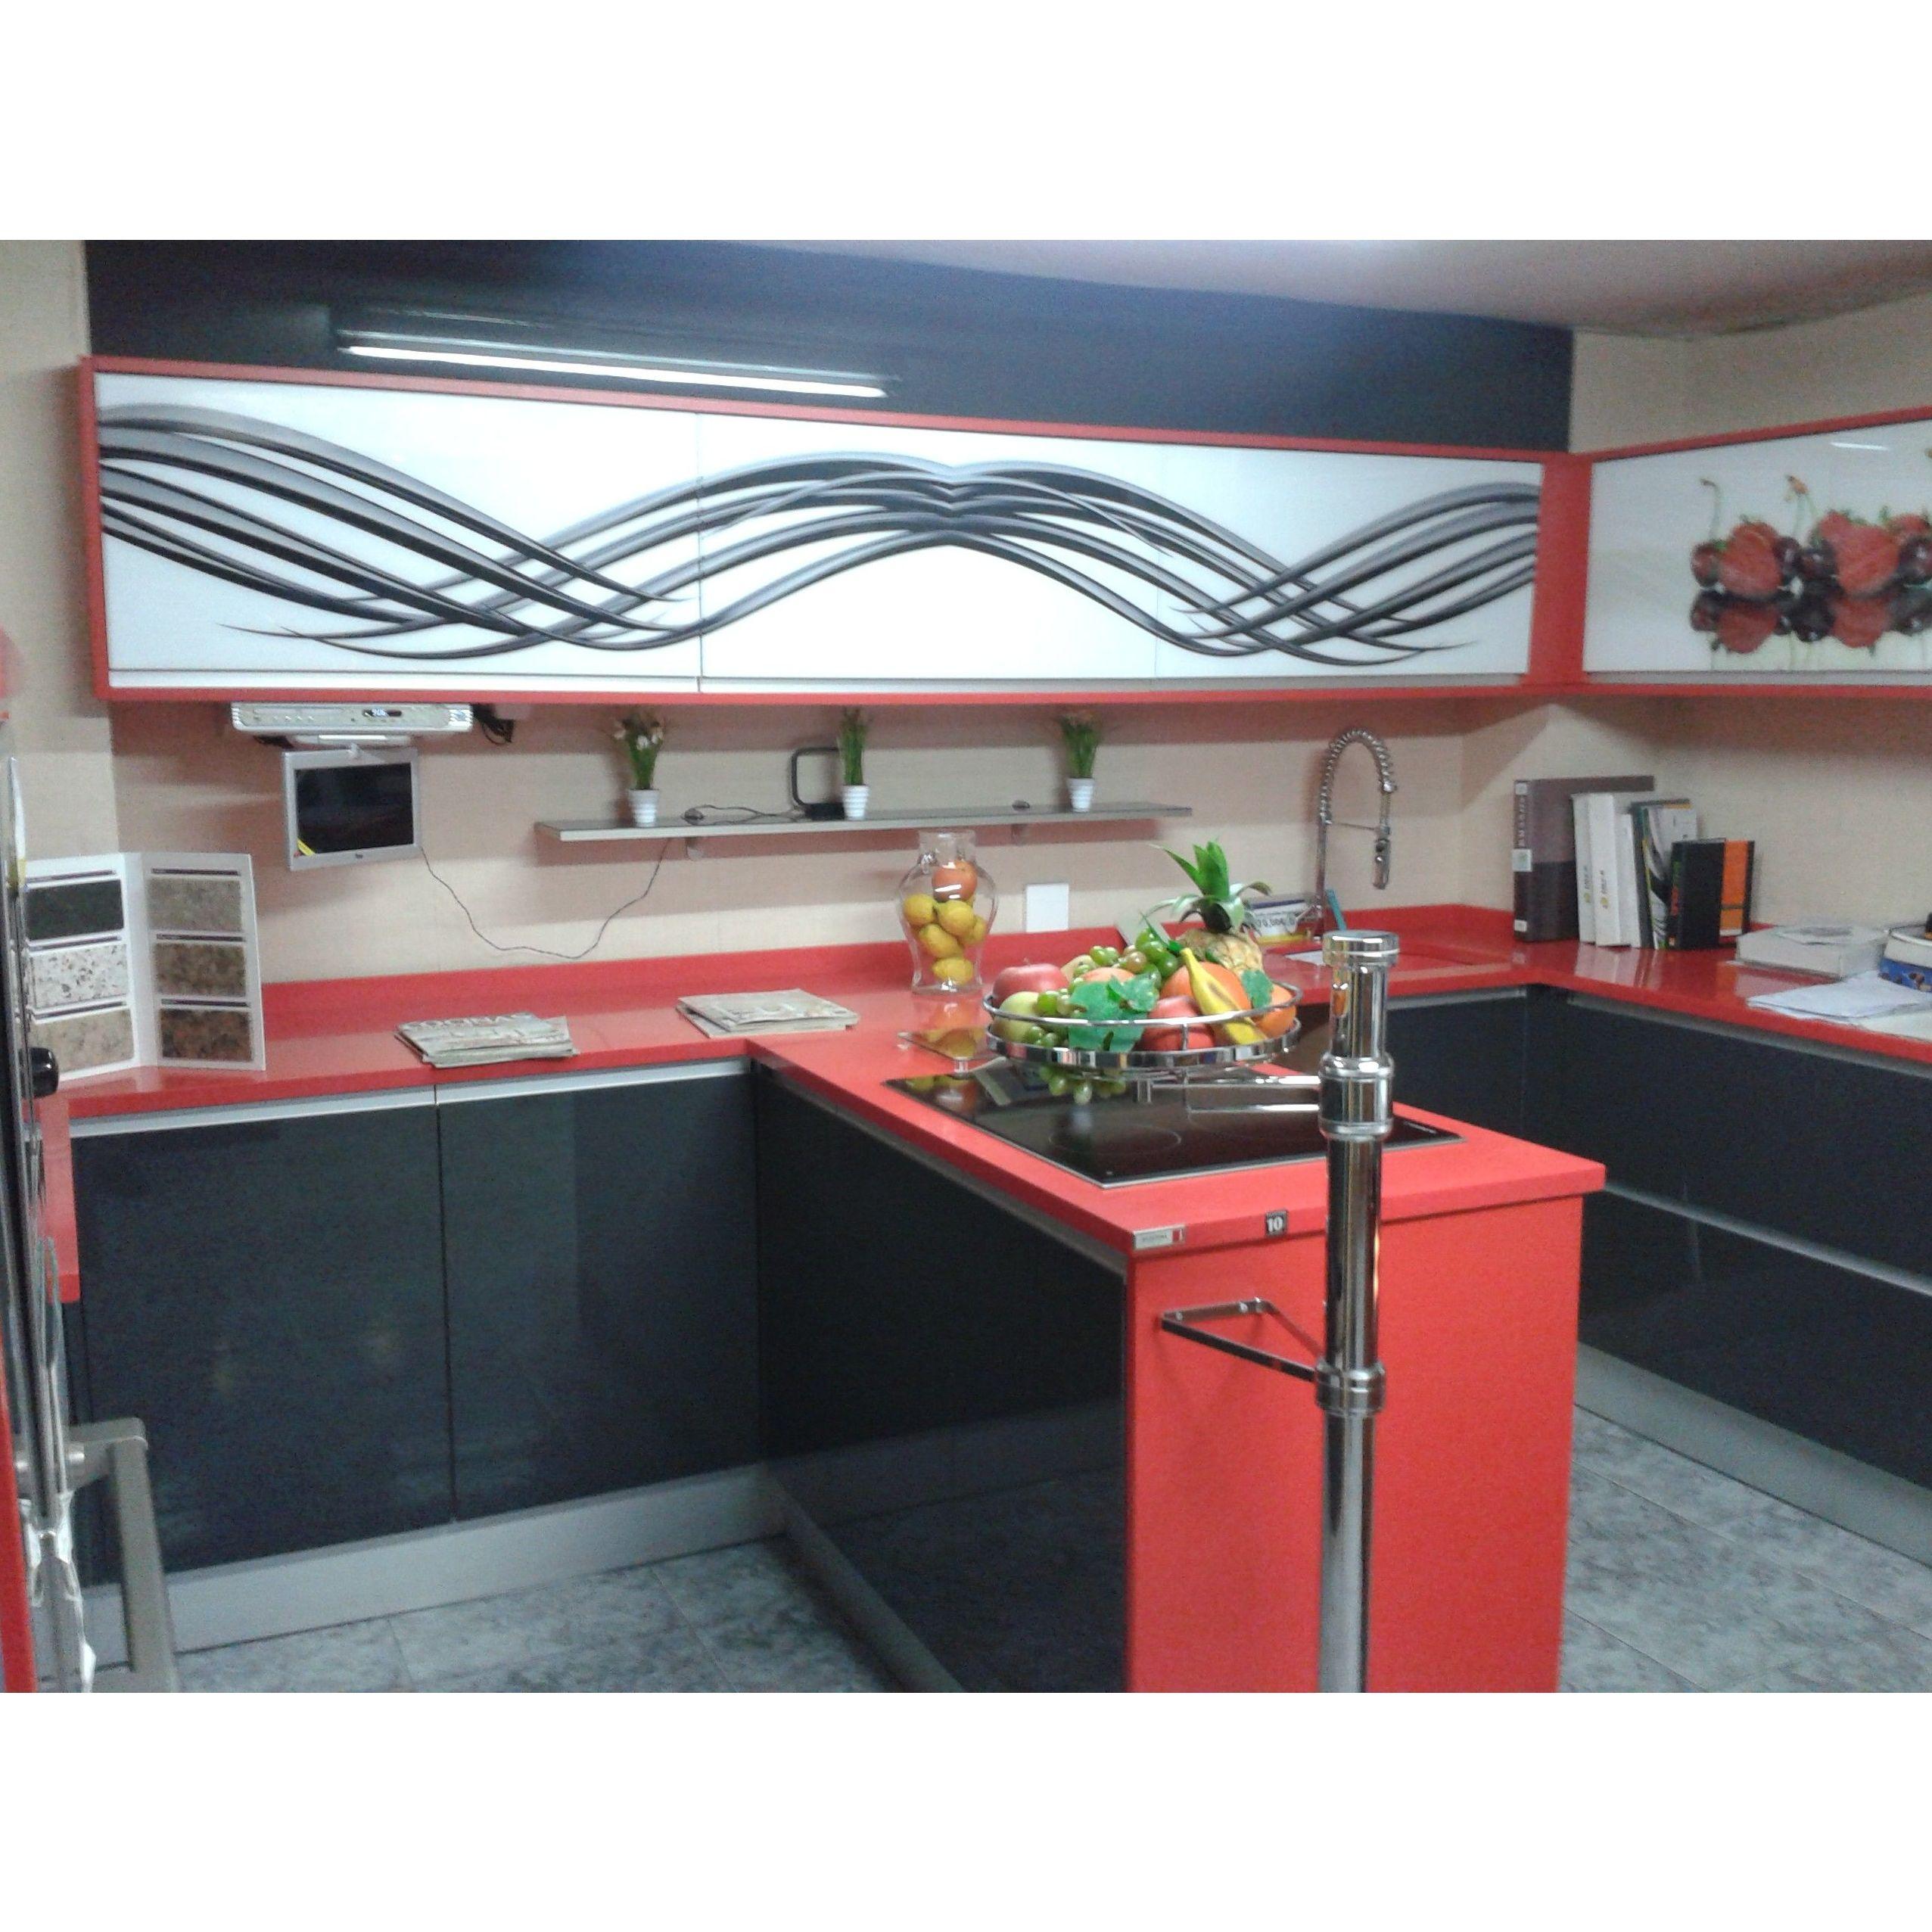 Mobiliario de cocina: Productos de Novolar